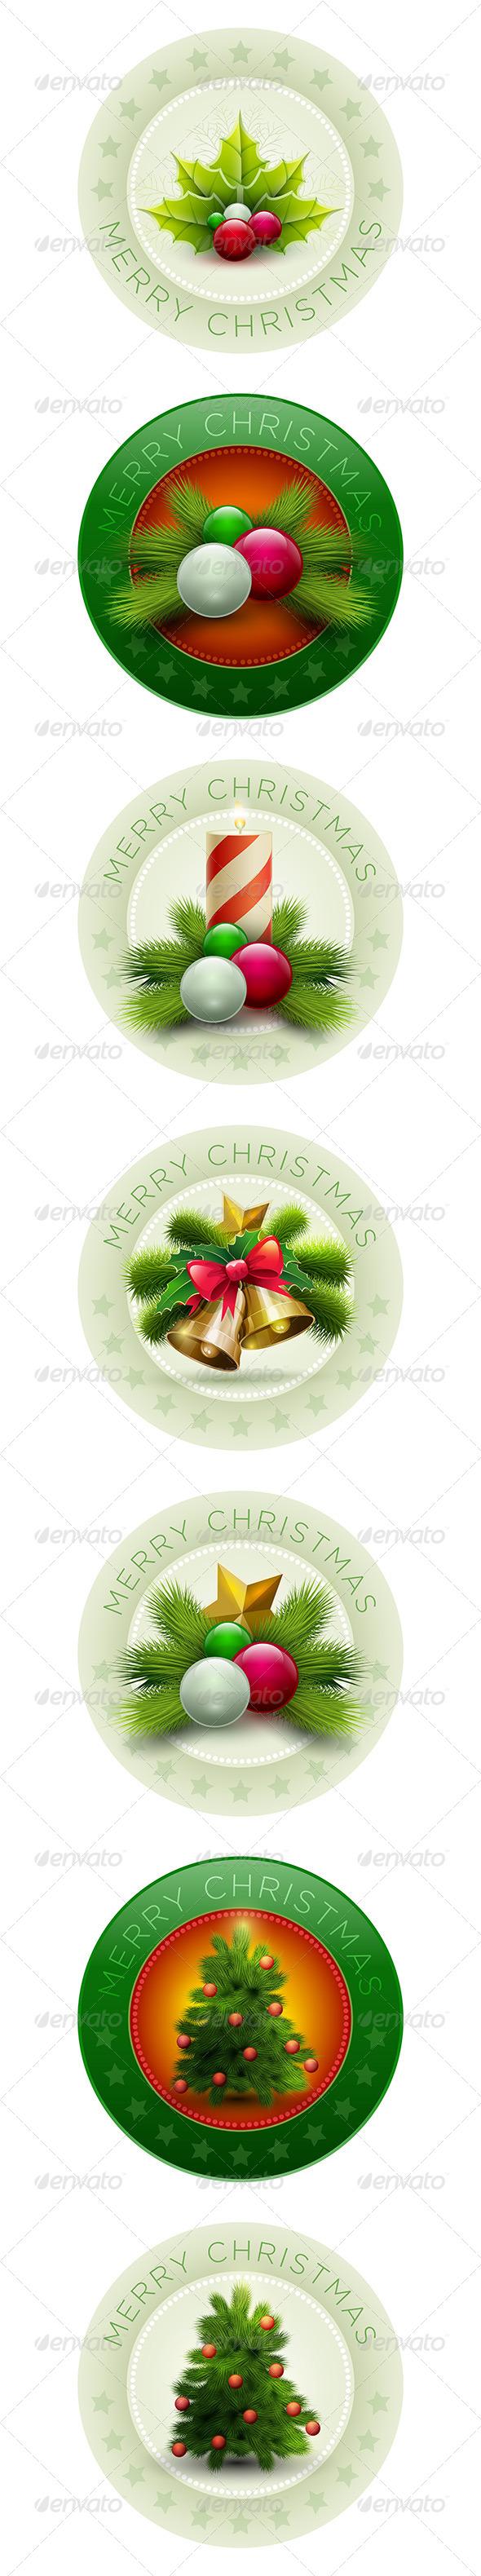 GraphicRiver Christmas Badge Collection 5999869